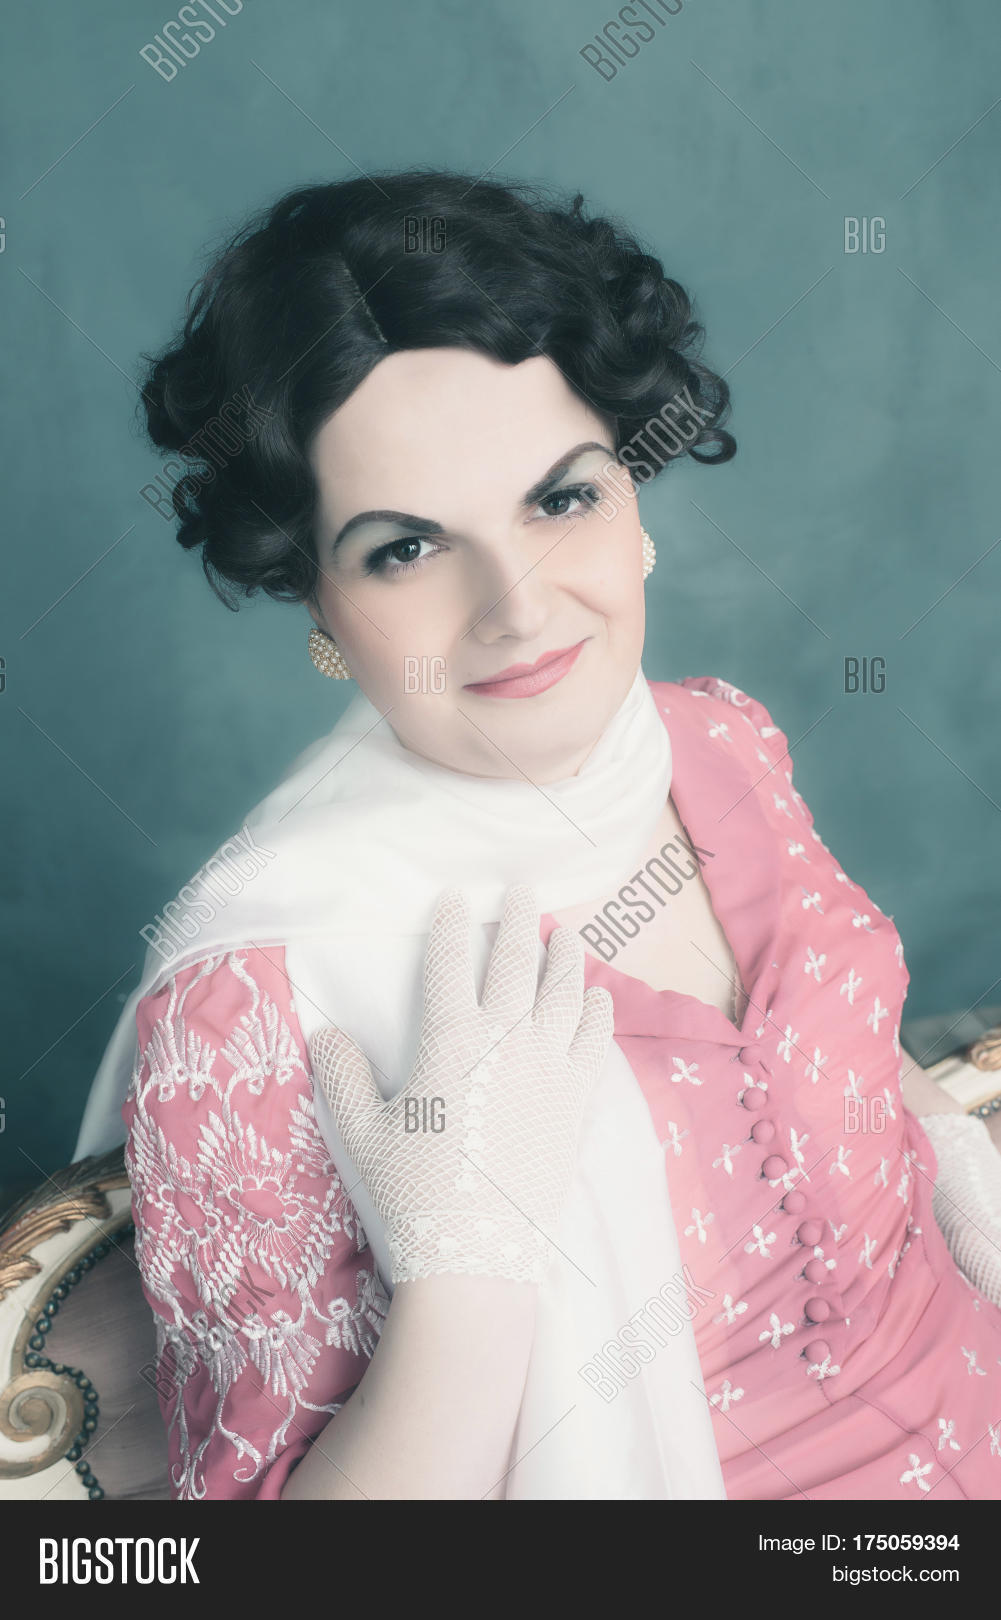 Transgender Woman Vintage 1920S Image & Photo | Bigstock